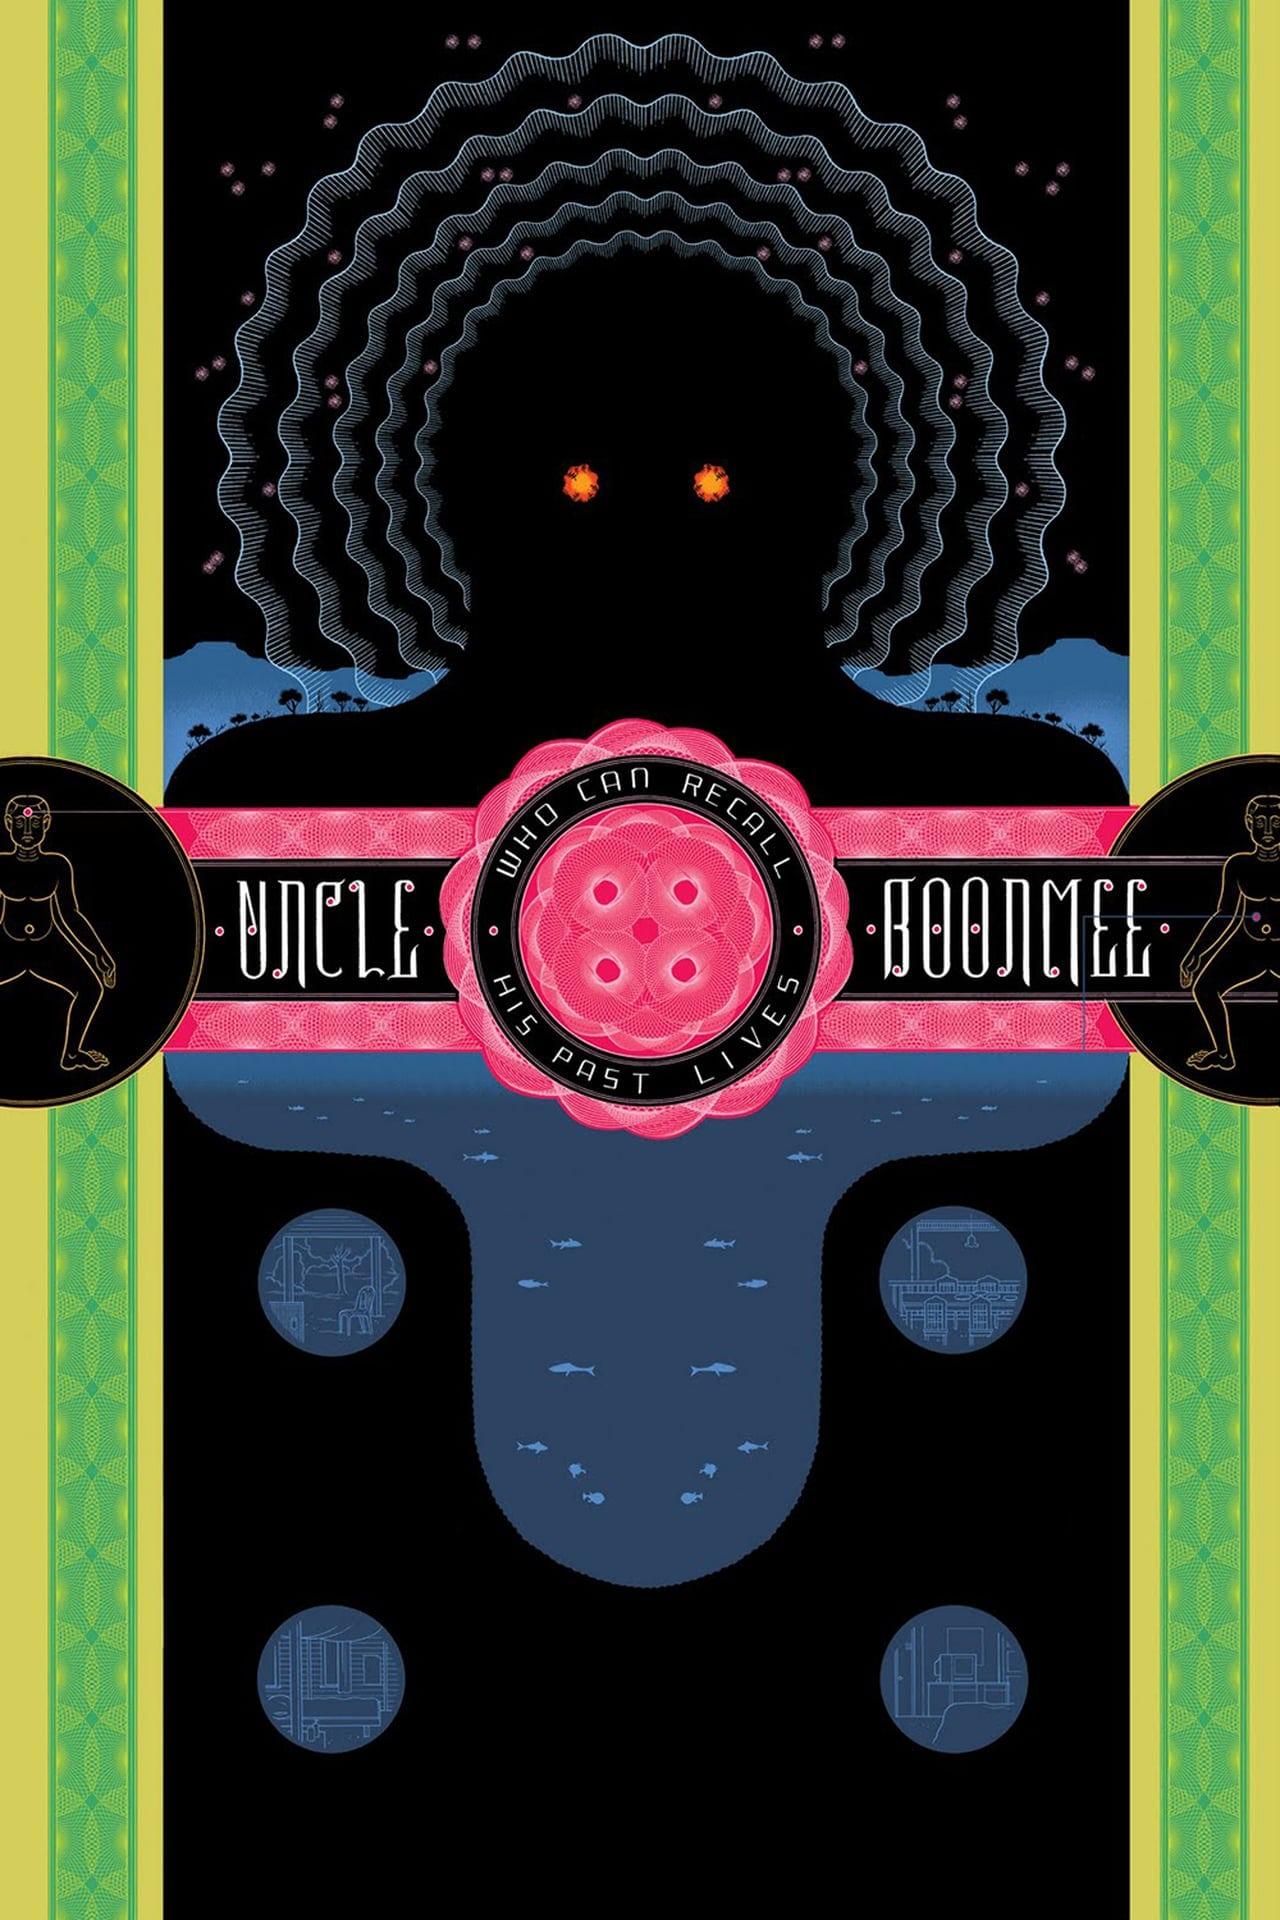 Tío Boonmee recuerda sus vidas pasadas